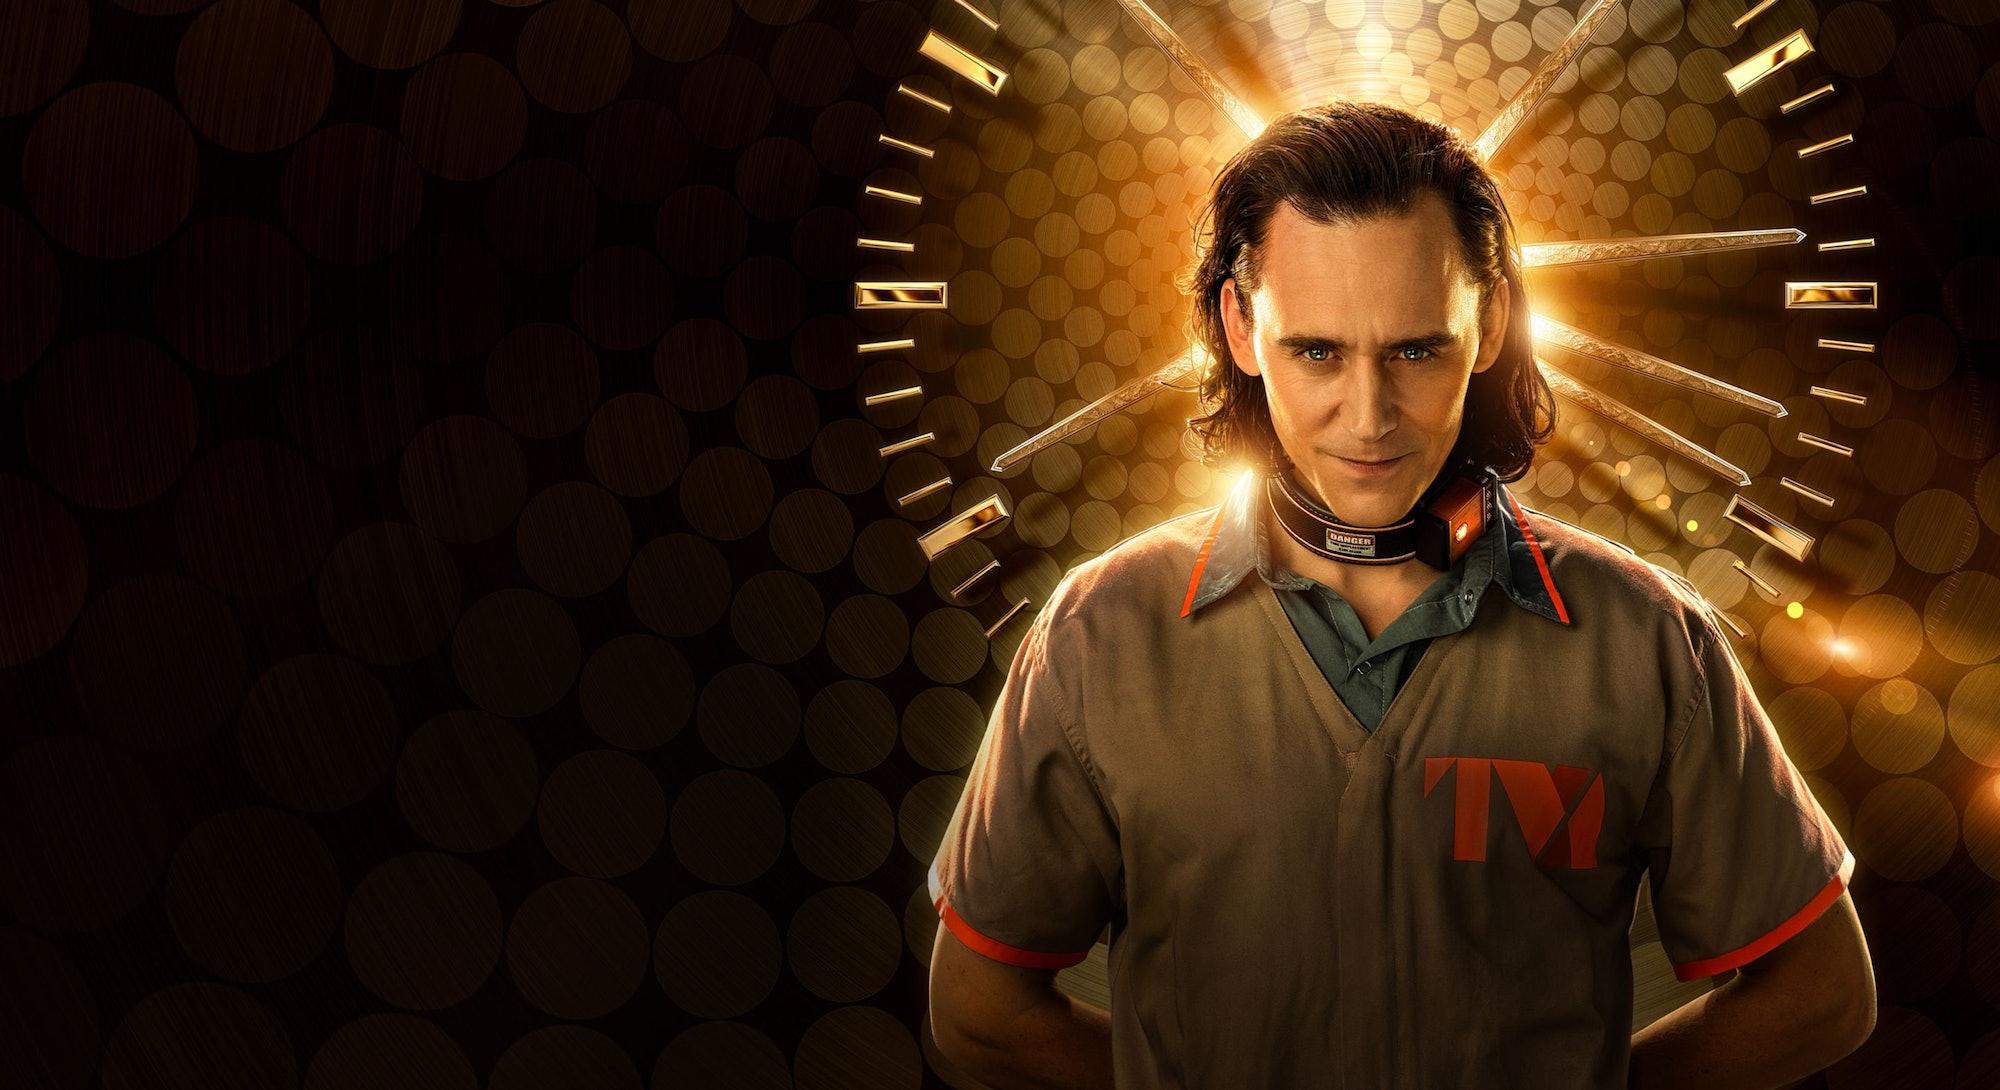 tom hiddleston as loki in disney plus promo image